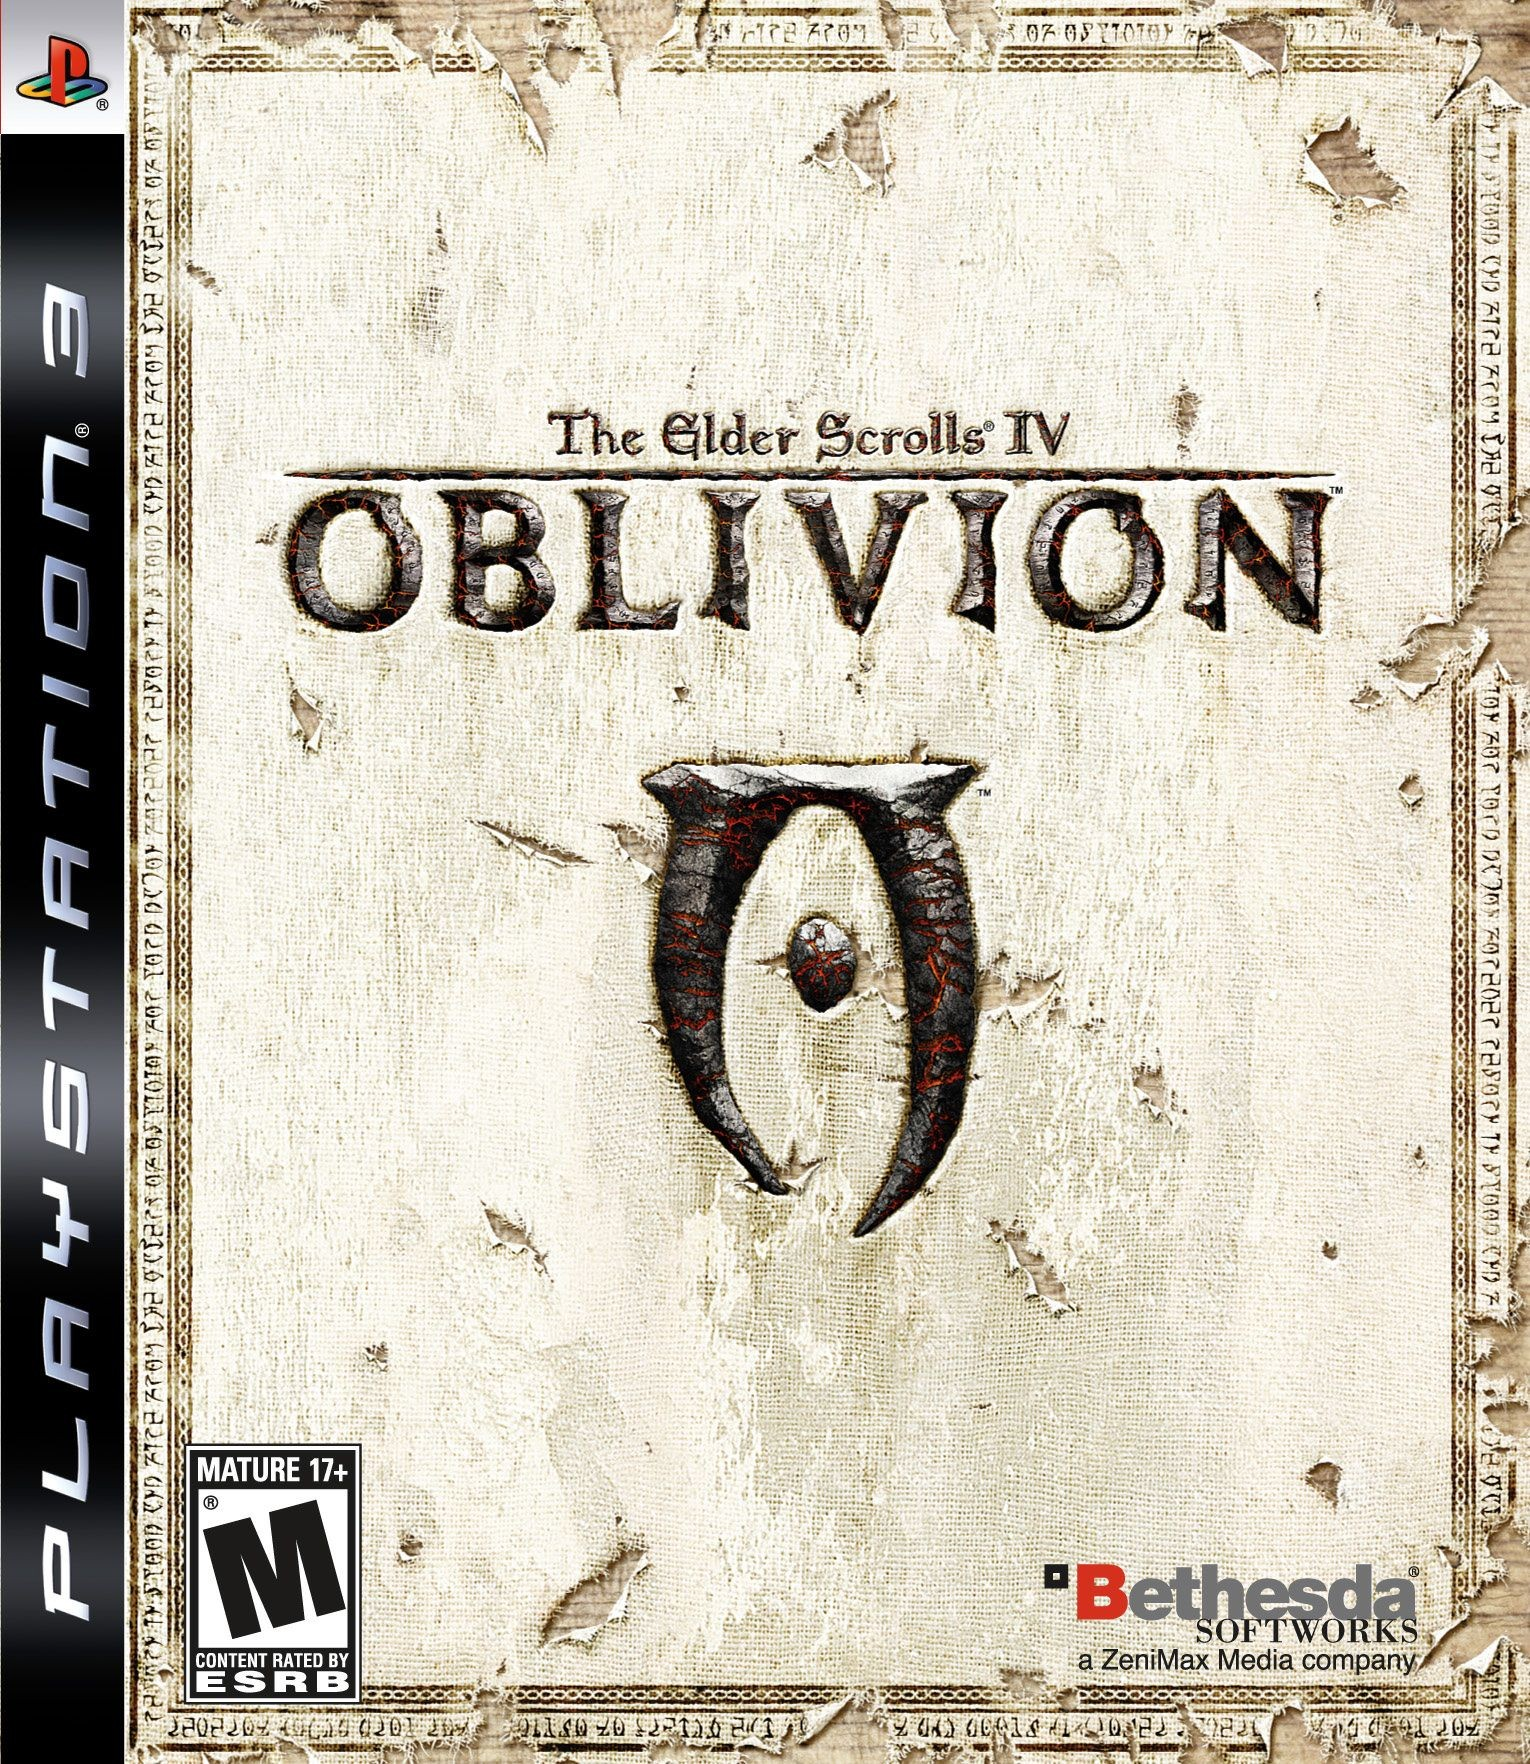 The Elder Scrolls IV Oblivion б/у PS3